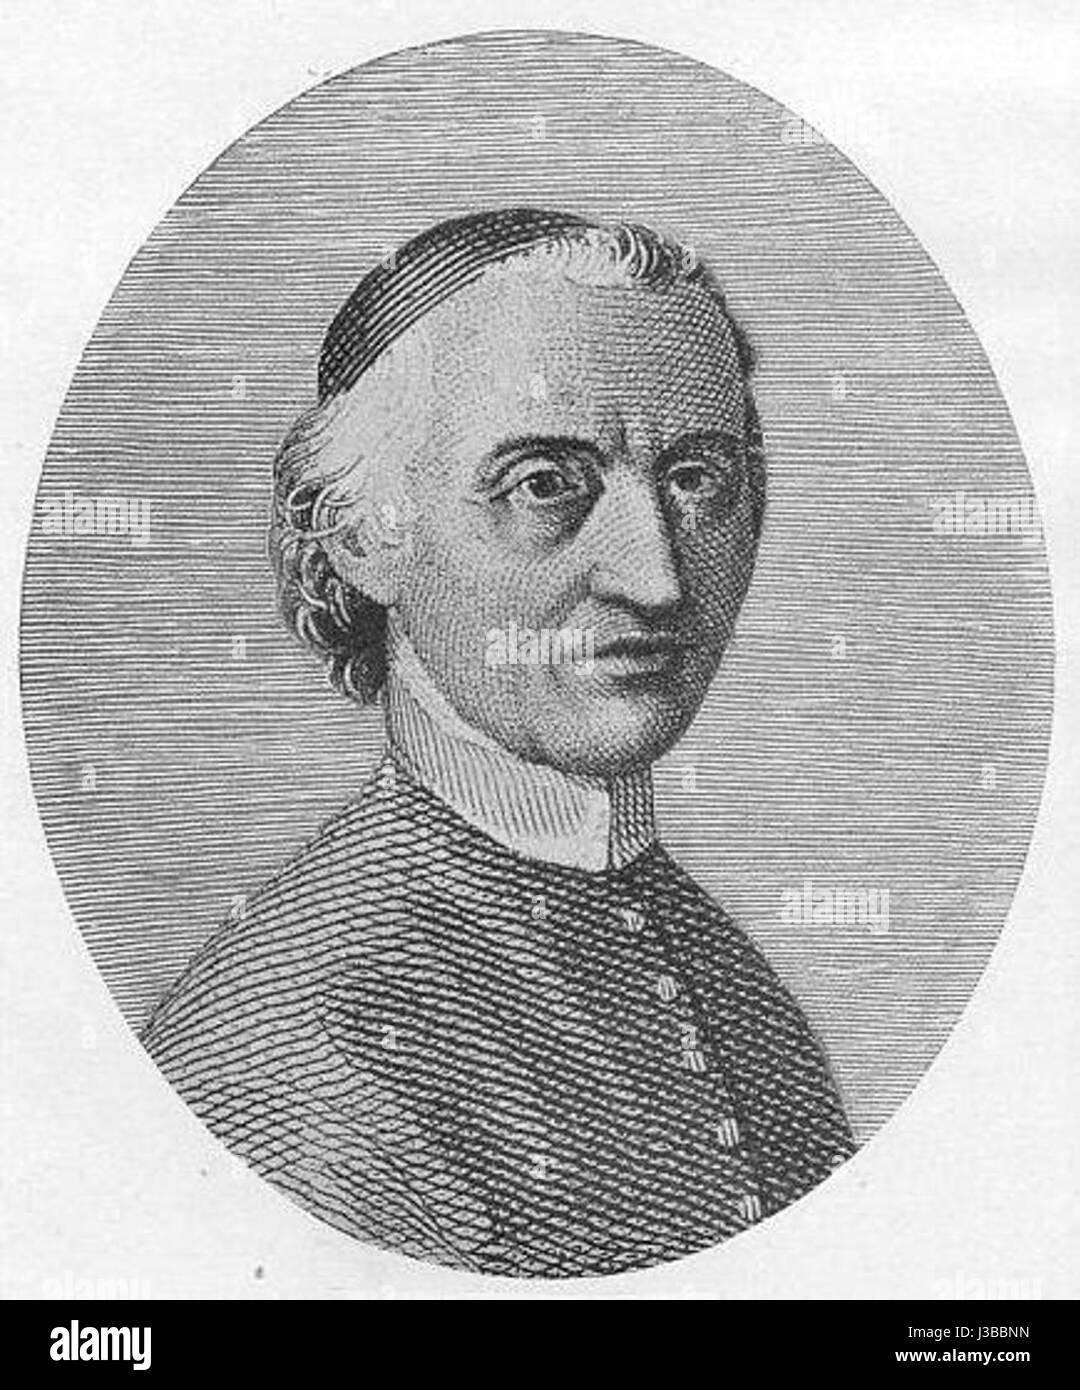 Egidio Forcellini immagina philologorum Immagini Stock